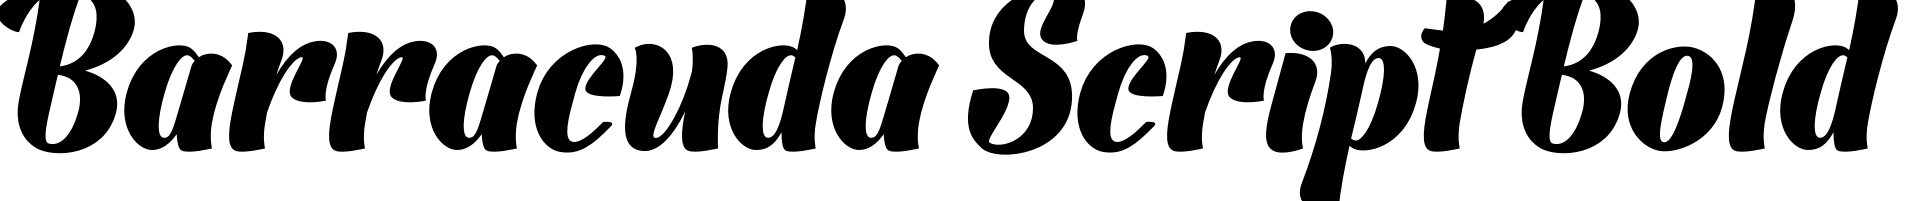 mazda b3000 fuel pump wiring diagram block wiring diagram 03 mazda b2300 truck mazda b2500 vacuum diagram mazda auto wiring diagram 1994 mazda b2300 wiring diagram mazda b2200 wiring diagram